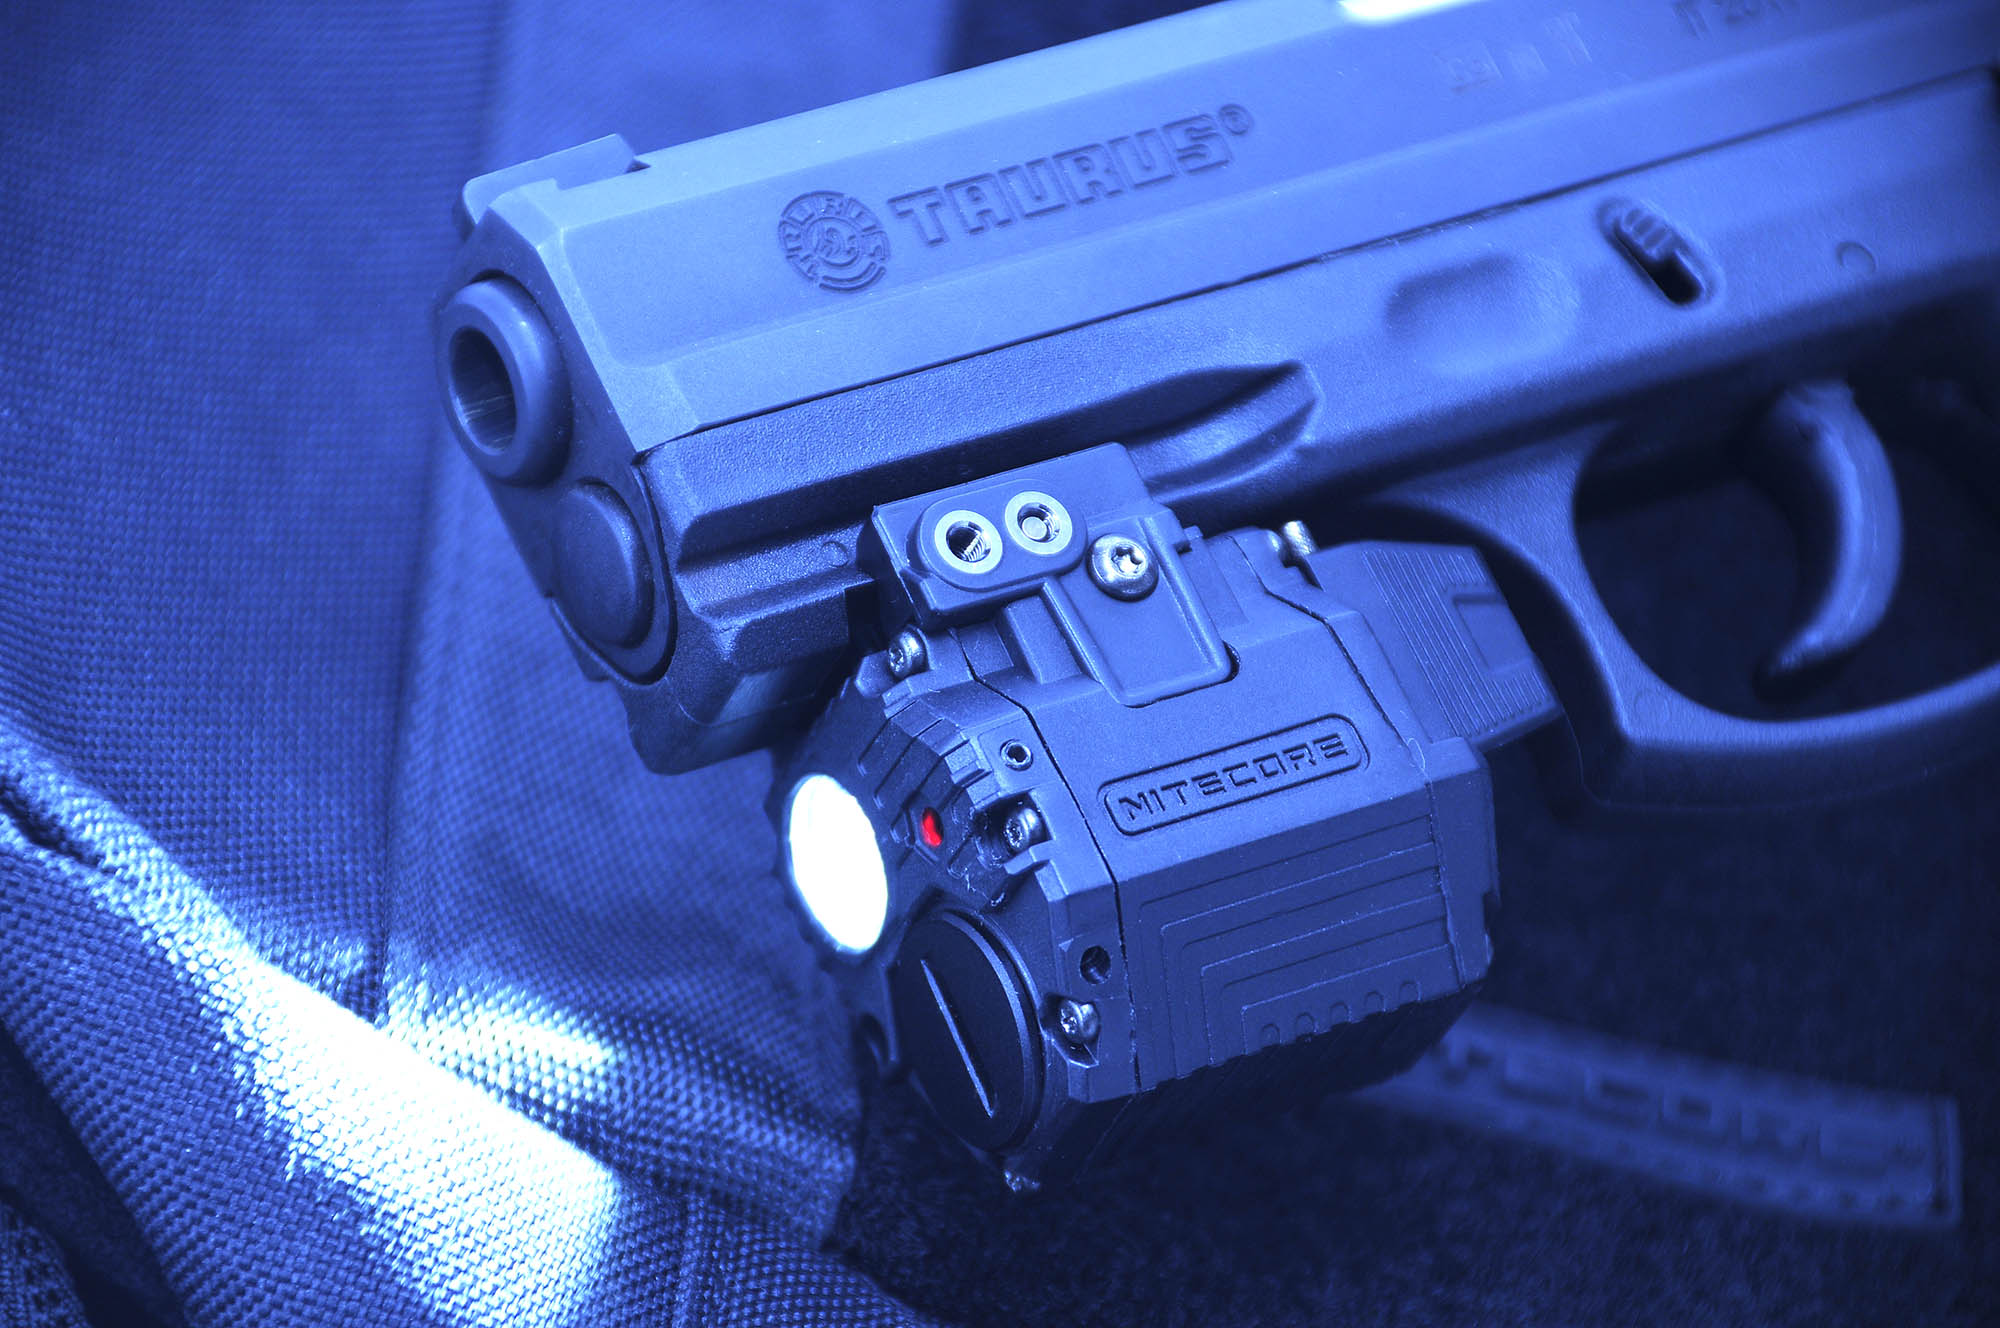 Nitecore NPL10 Tactical Pistol flashlight | GUNSweek com